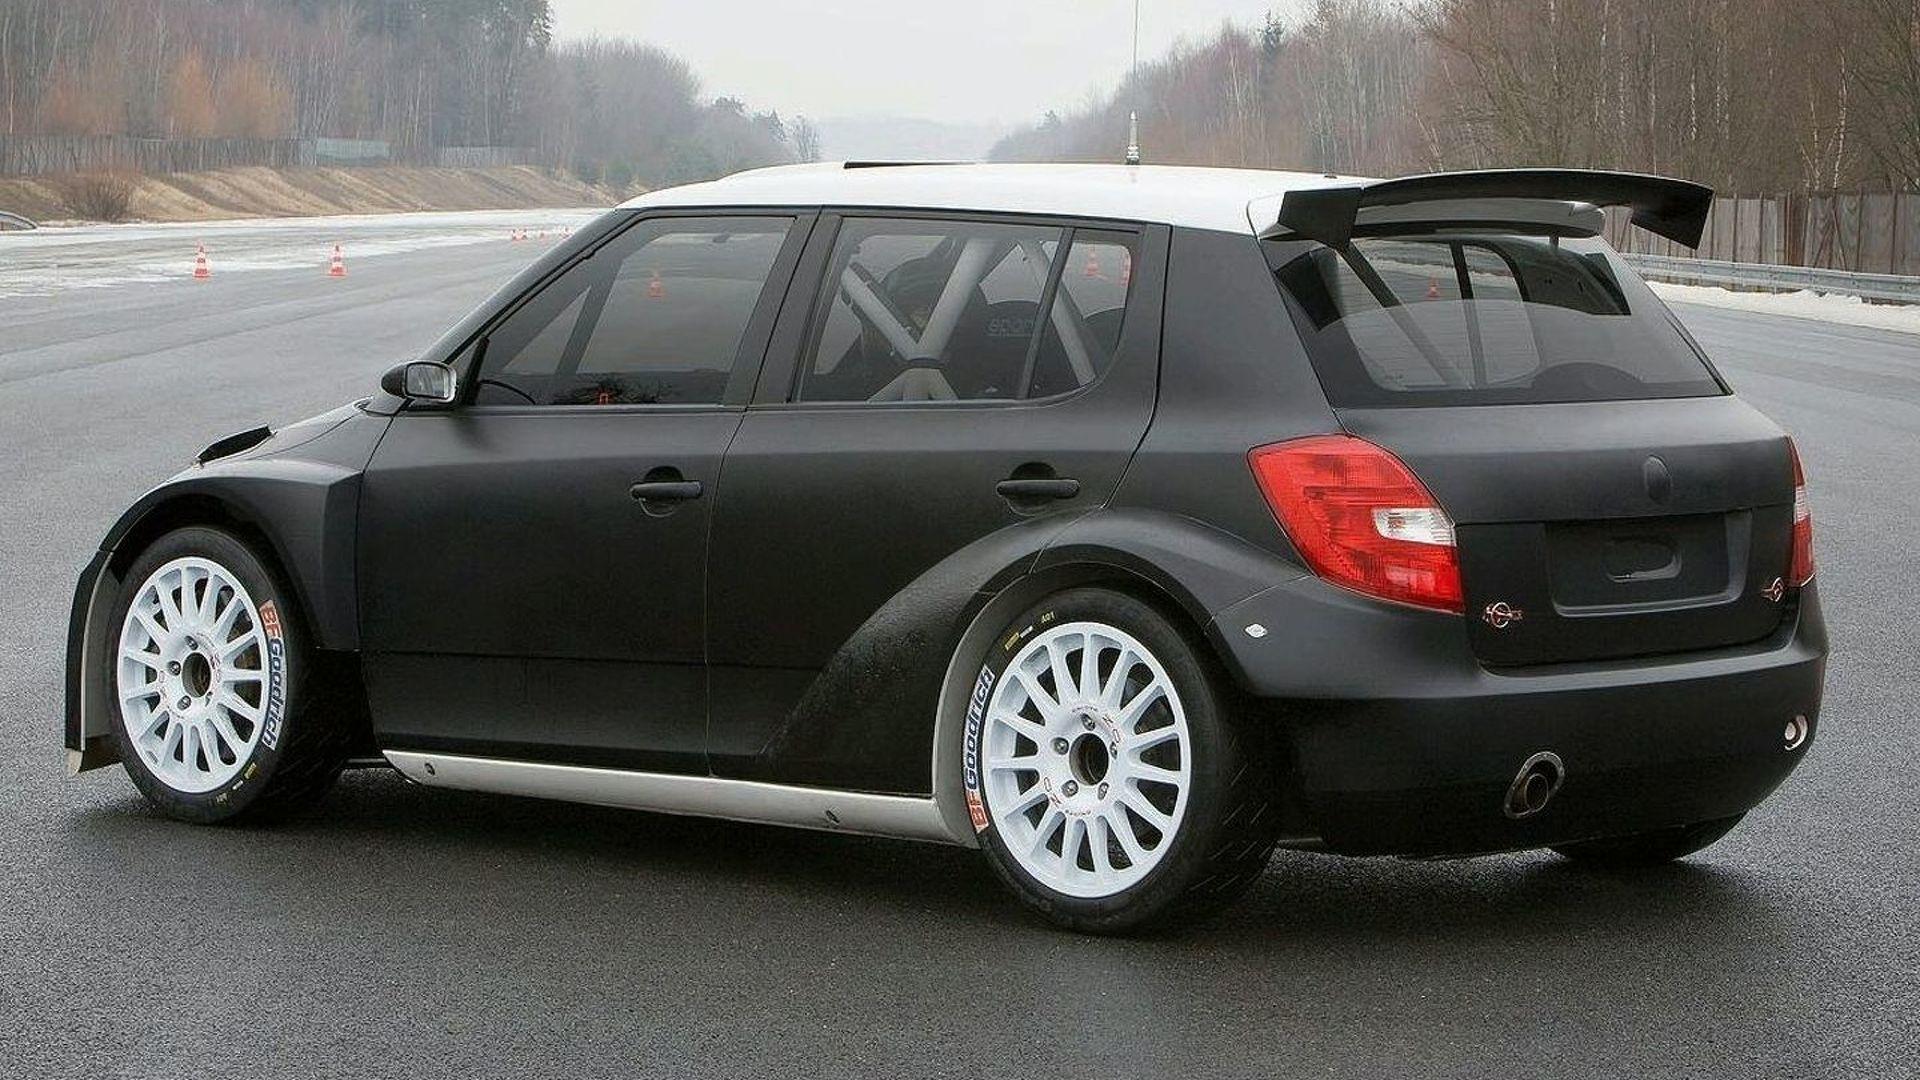 2008-22082-skoda-s2000-on-test1.jpg